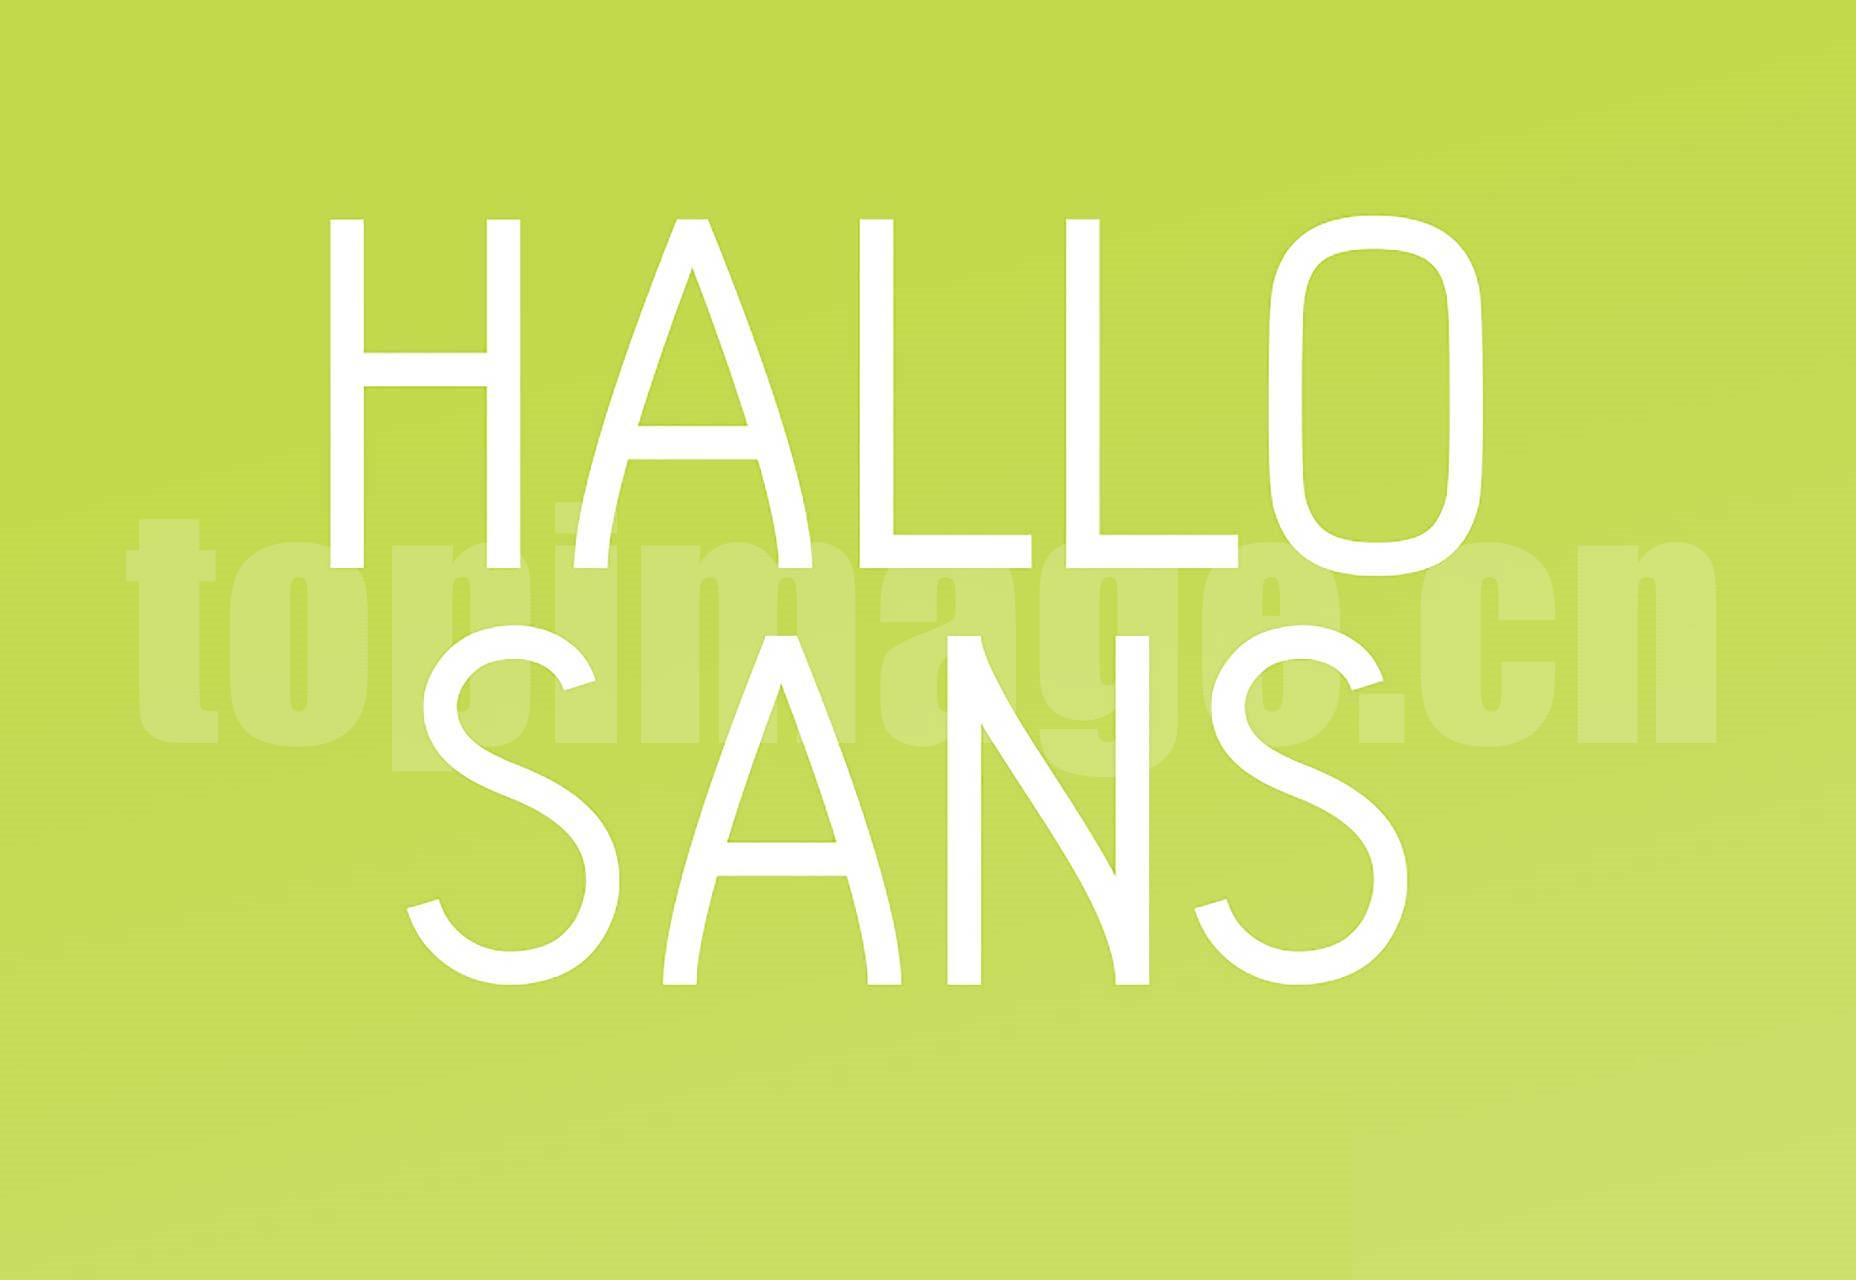 Hallo sans 海报logo 简洁纤细 英文字体下载